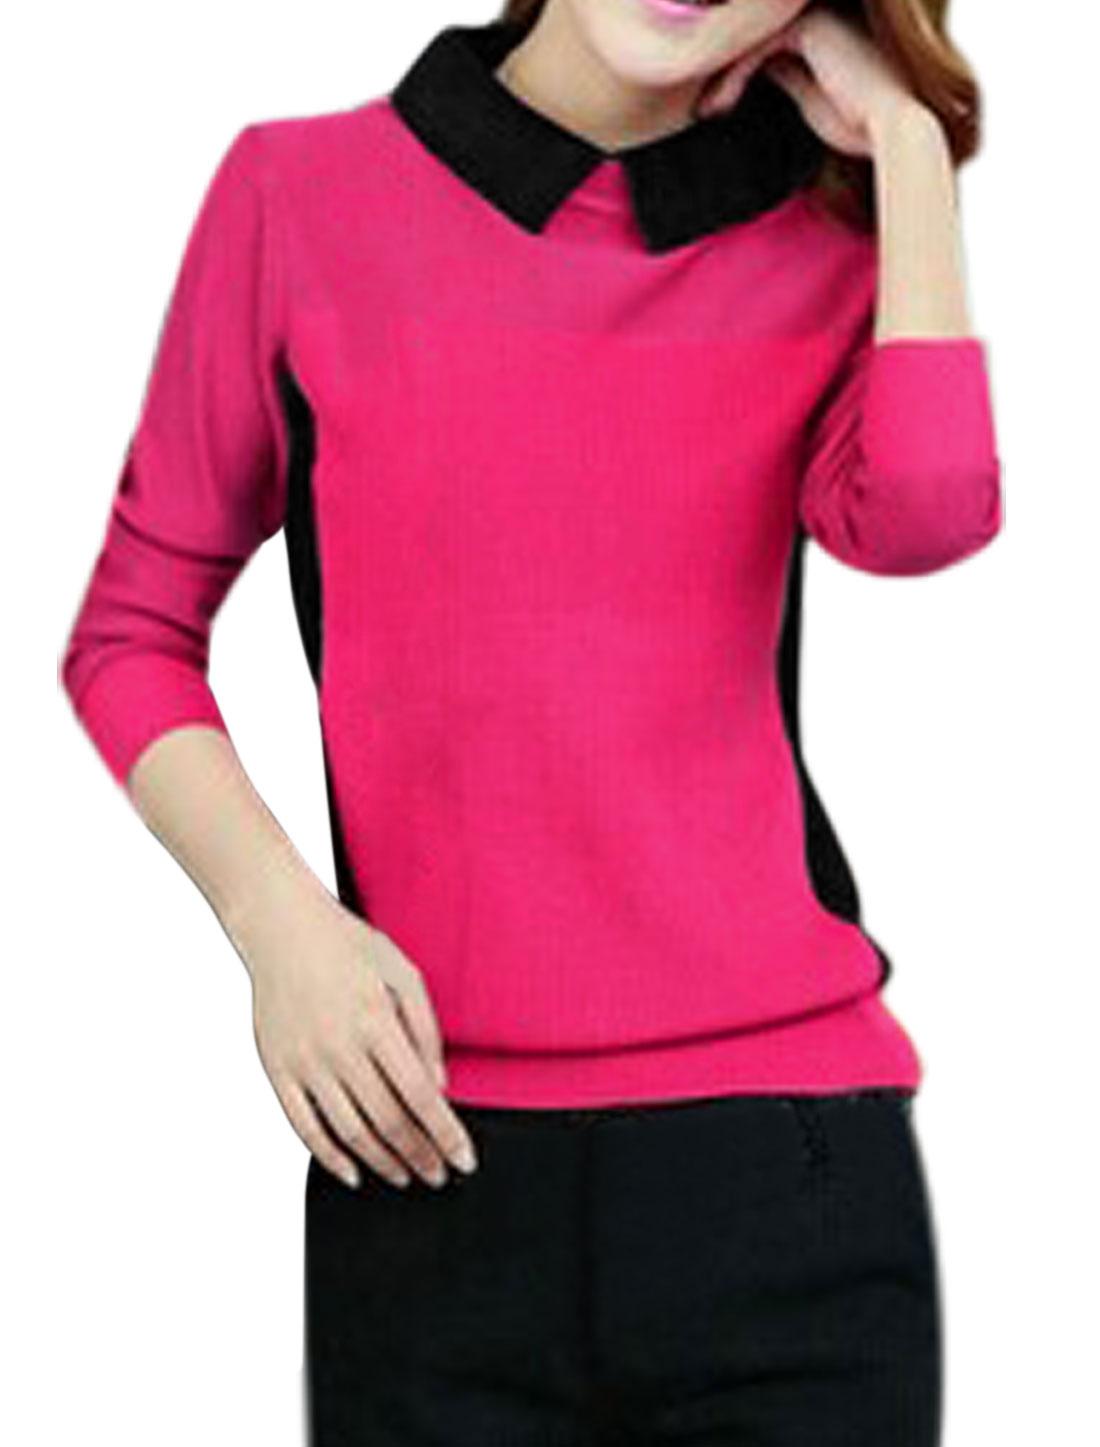 Women Point Collar Contrast Color Long Sleeve Knit Shirt Fuchsia S